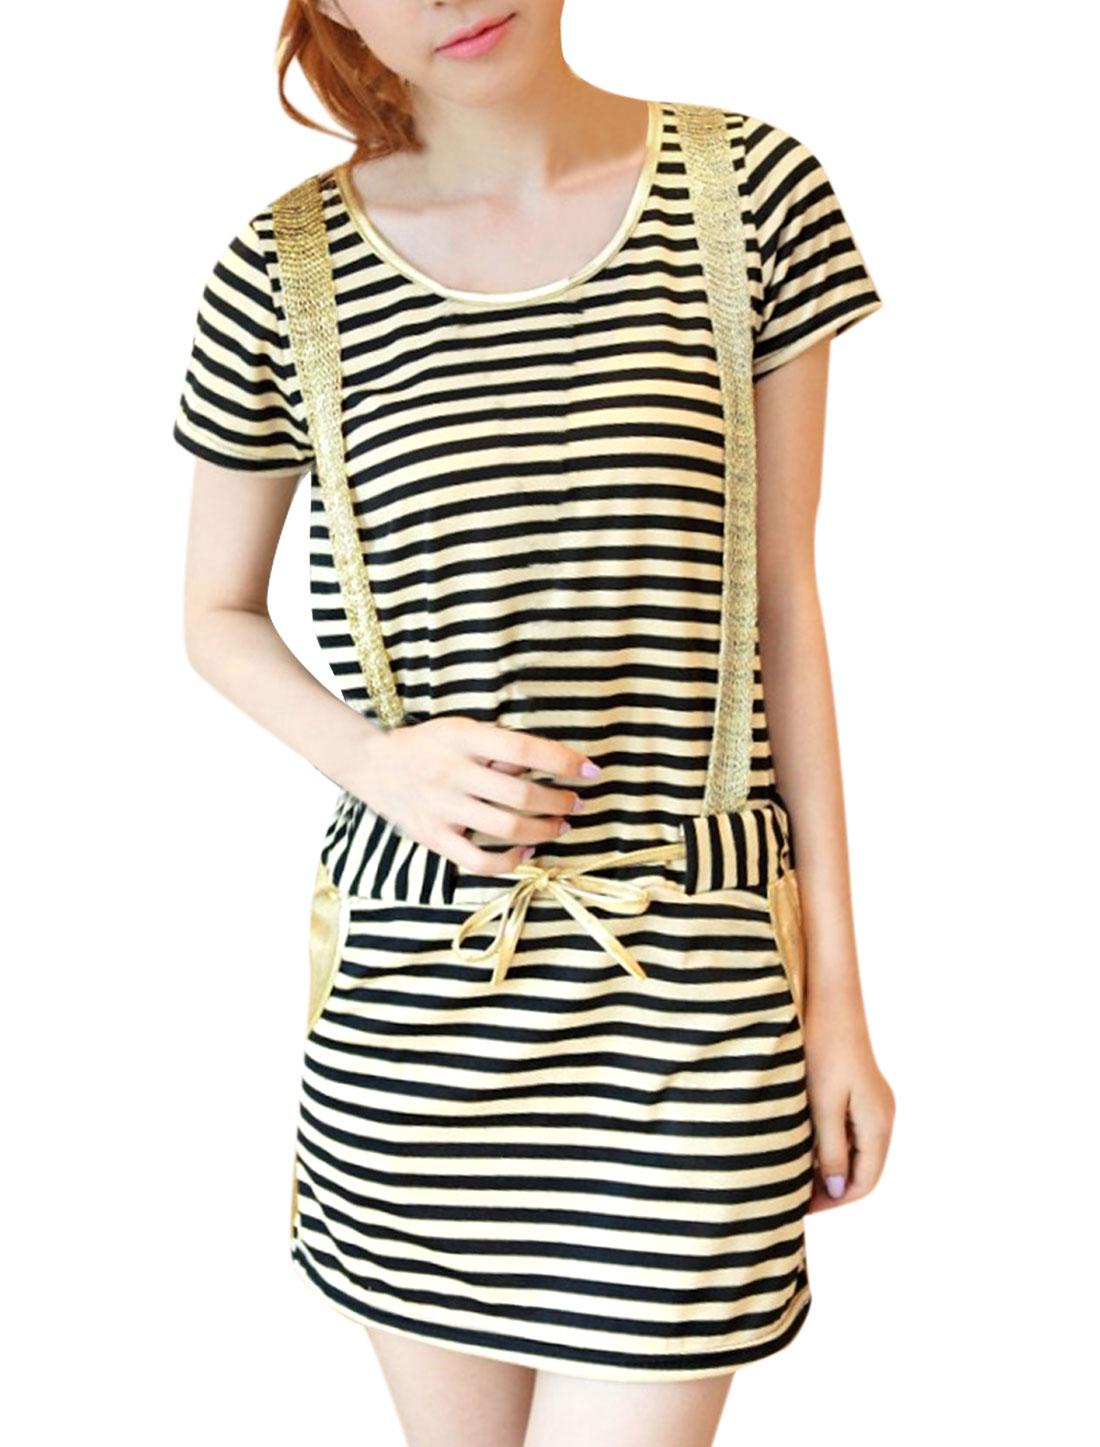 Lady Beige Black Stripes Round Neck Short Sleeve Slant Pocket Dress XS